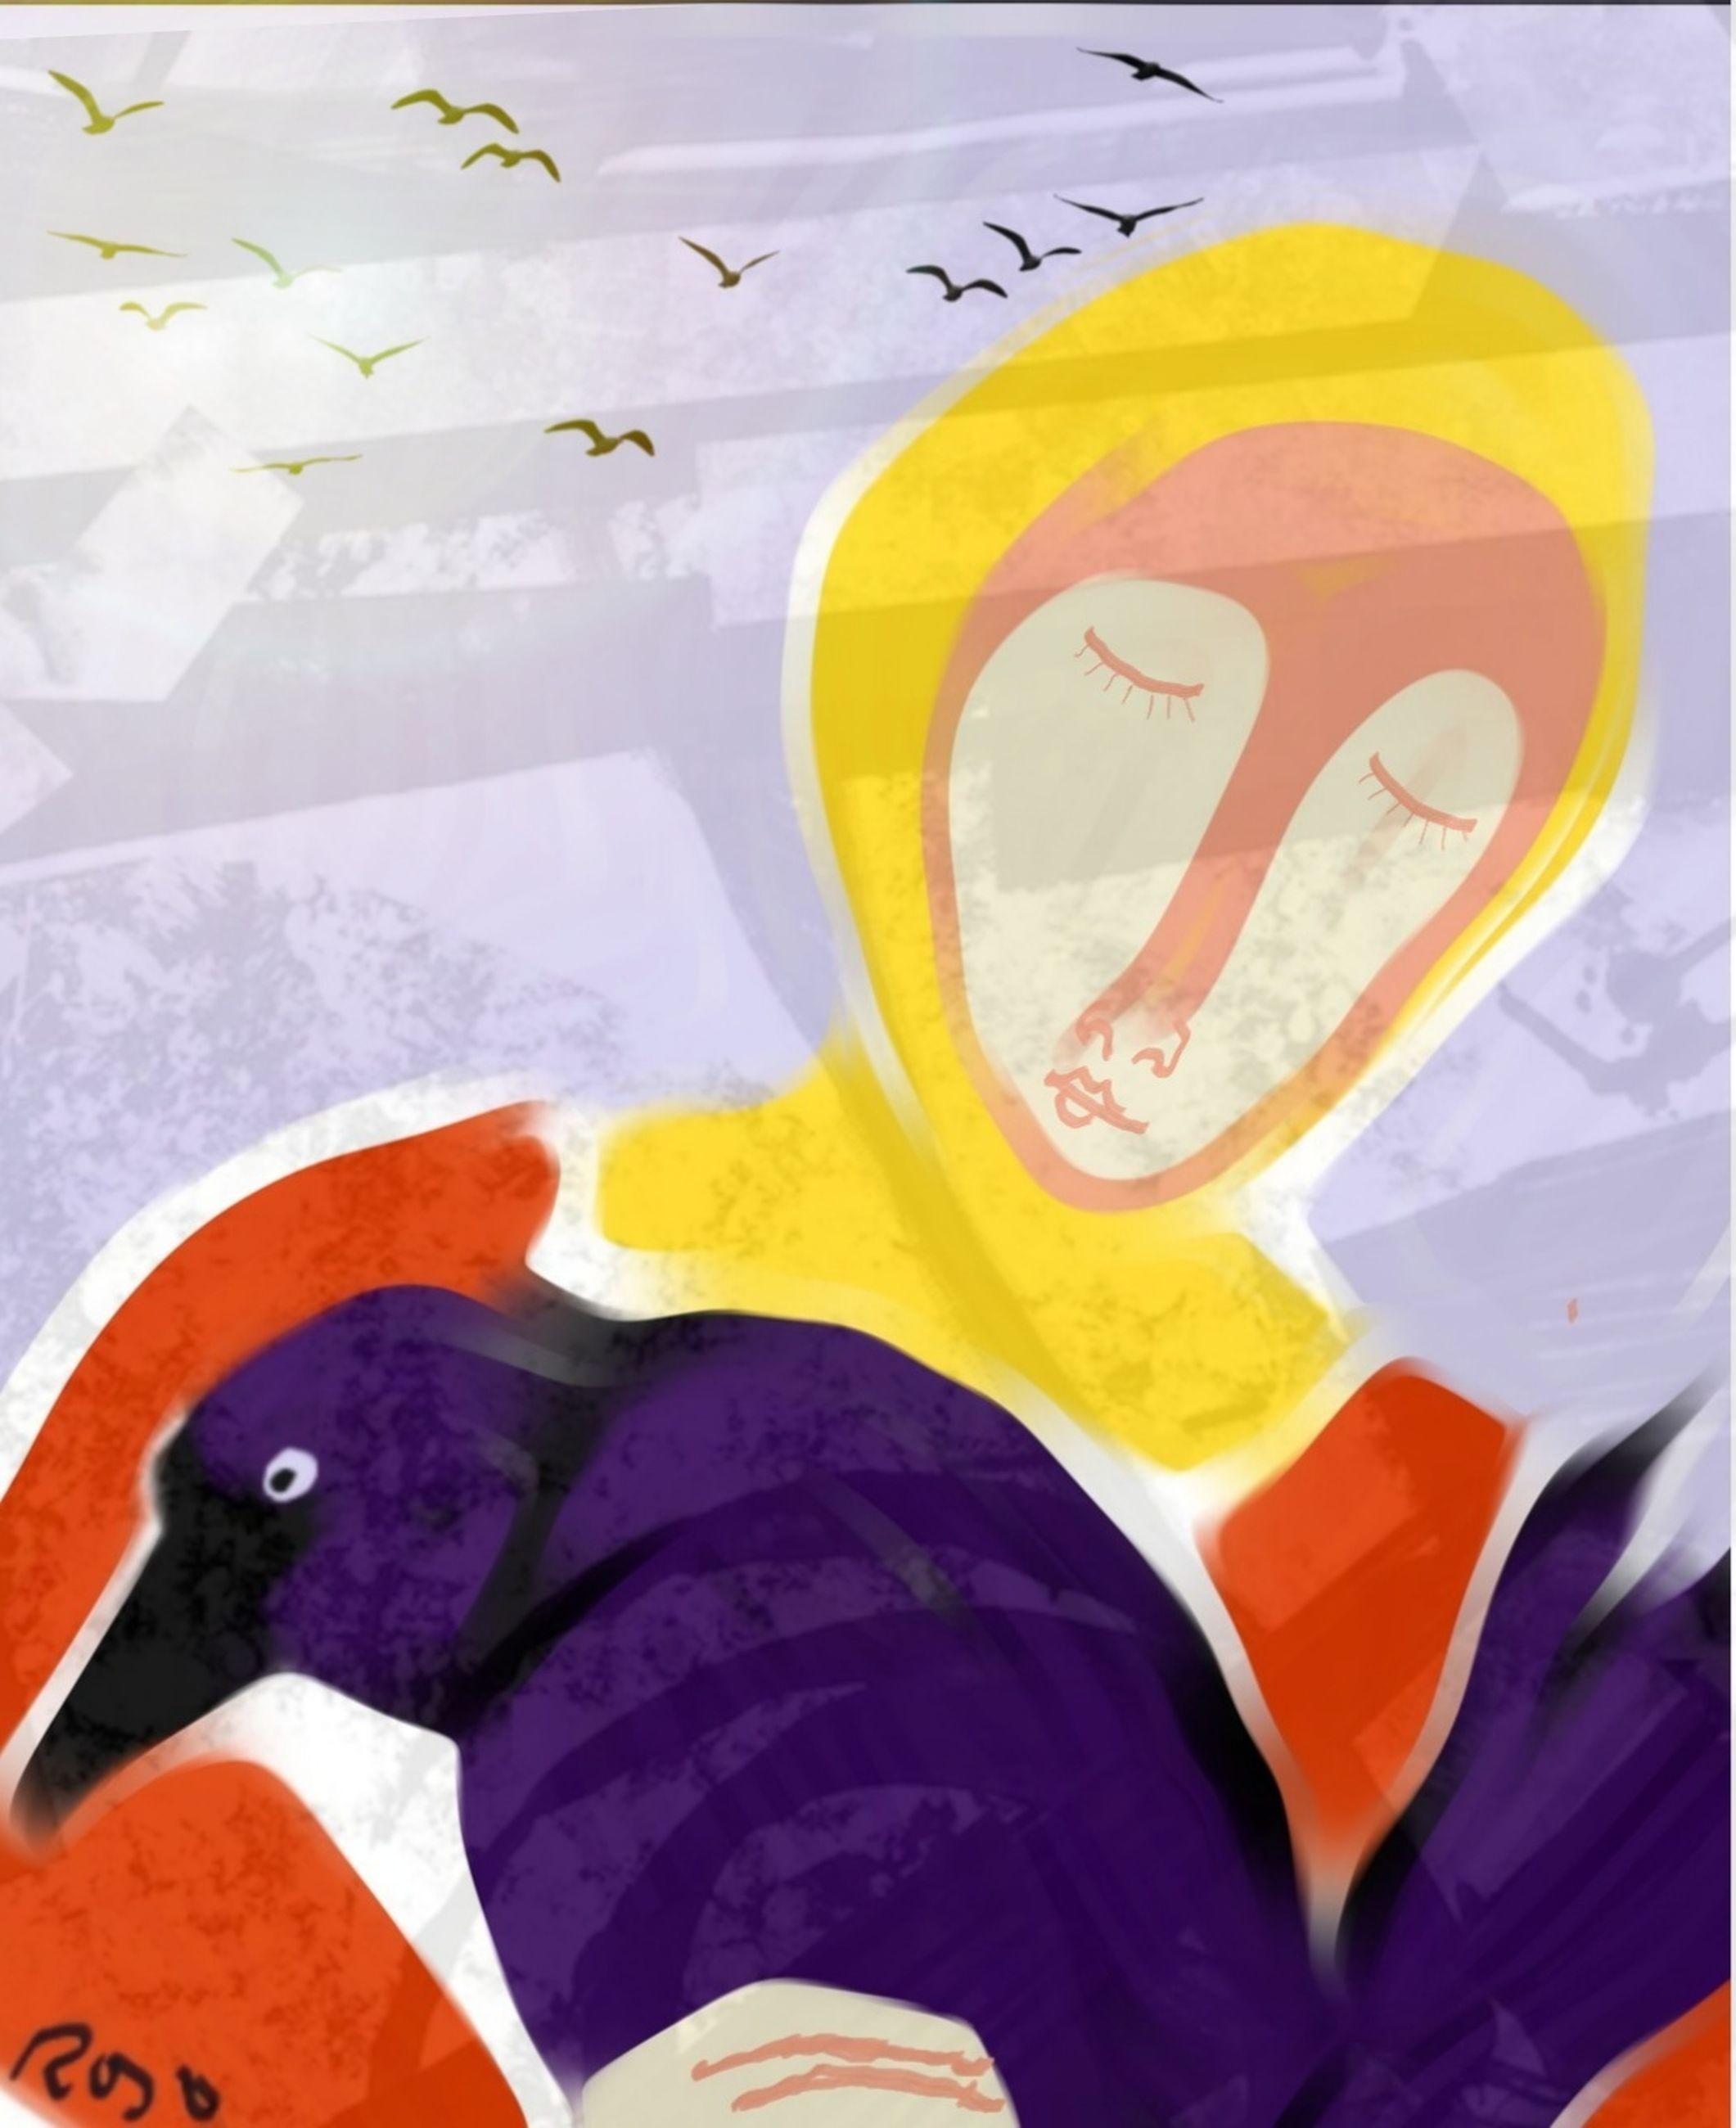 bird, cartoon, multi colored, creativity, paper, no people